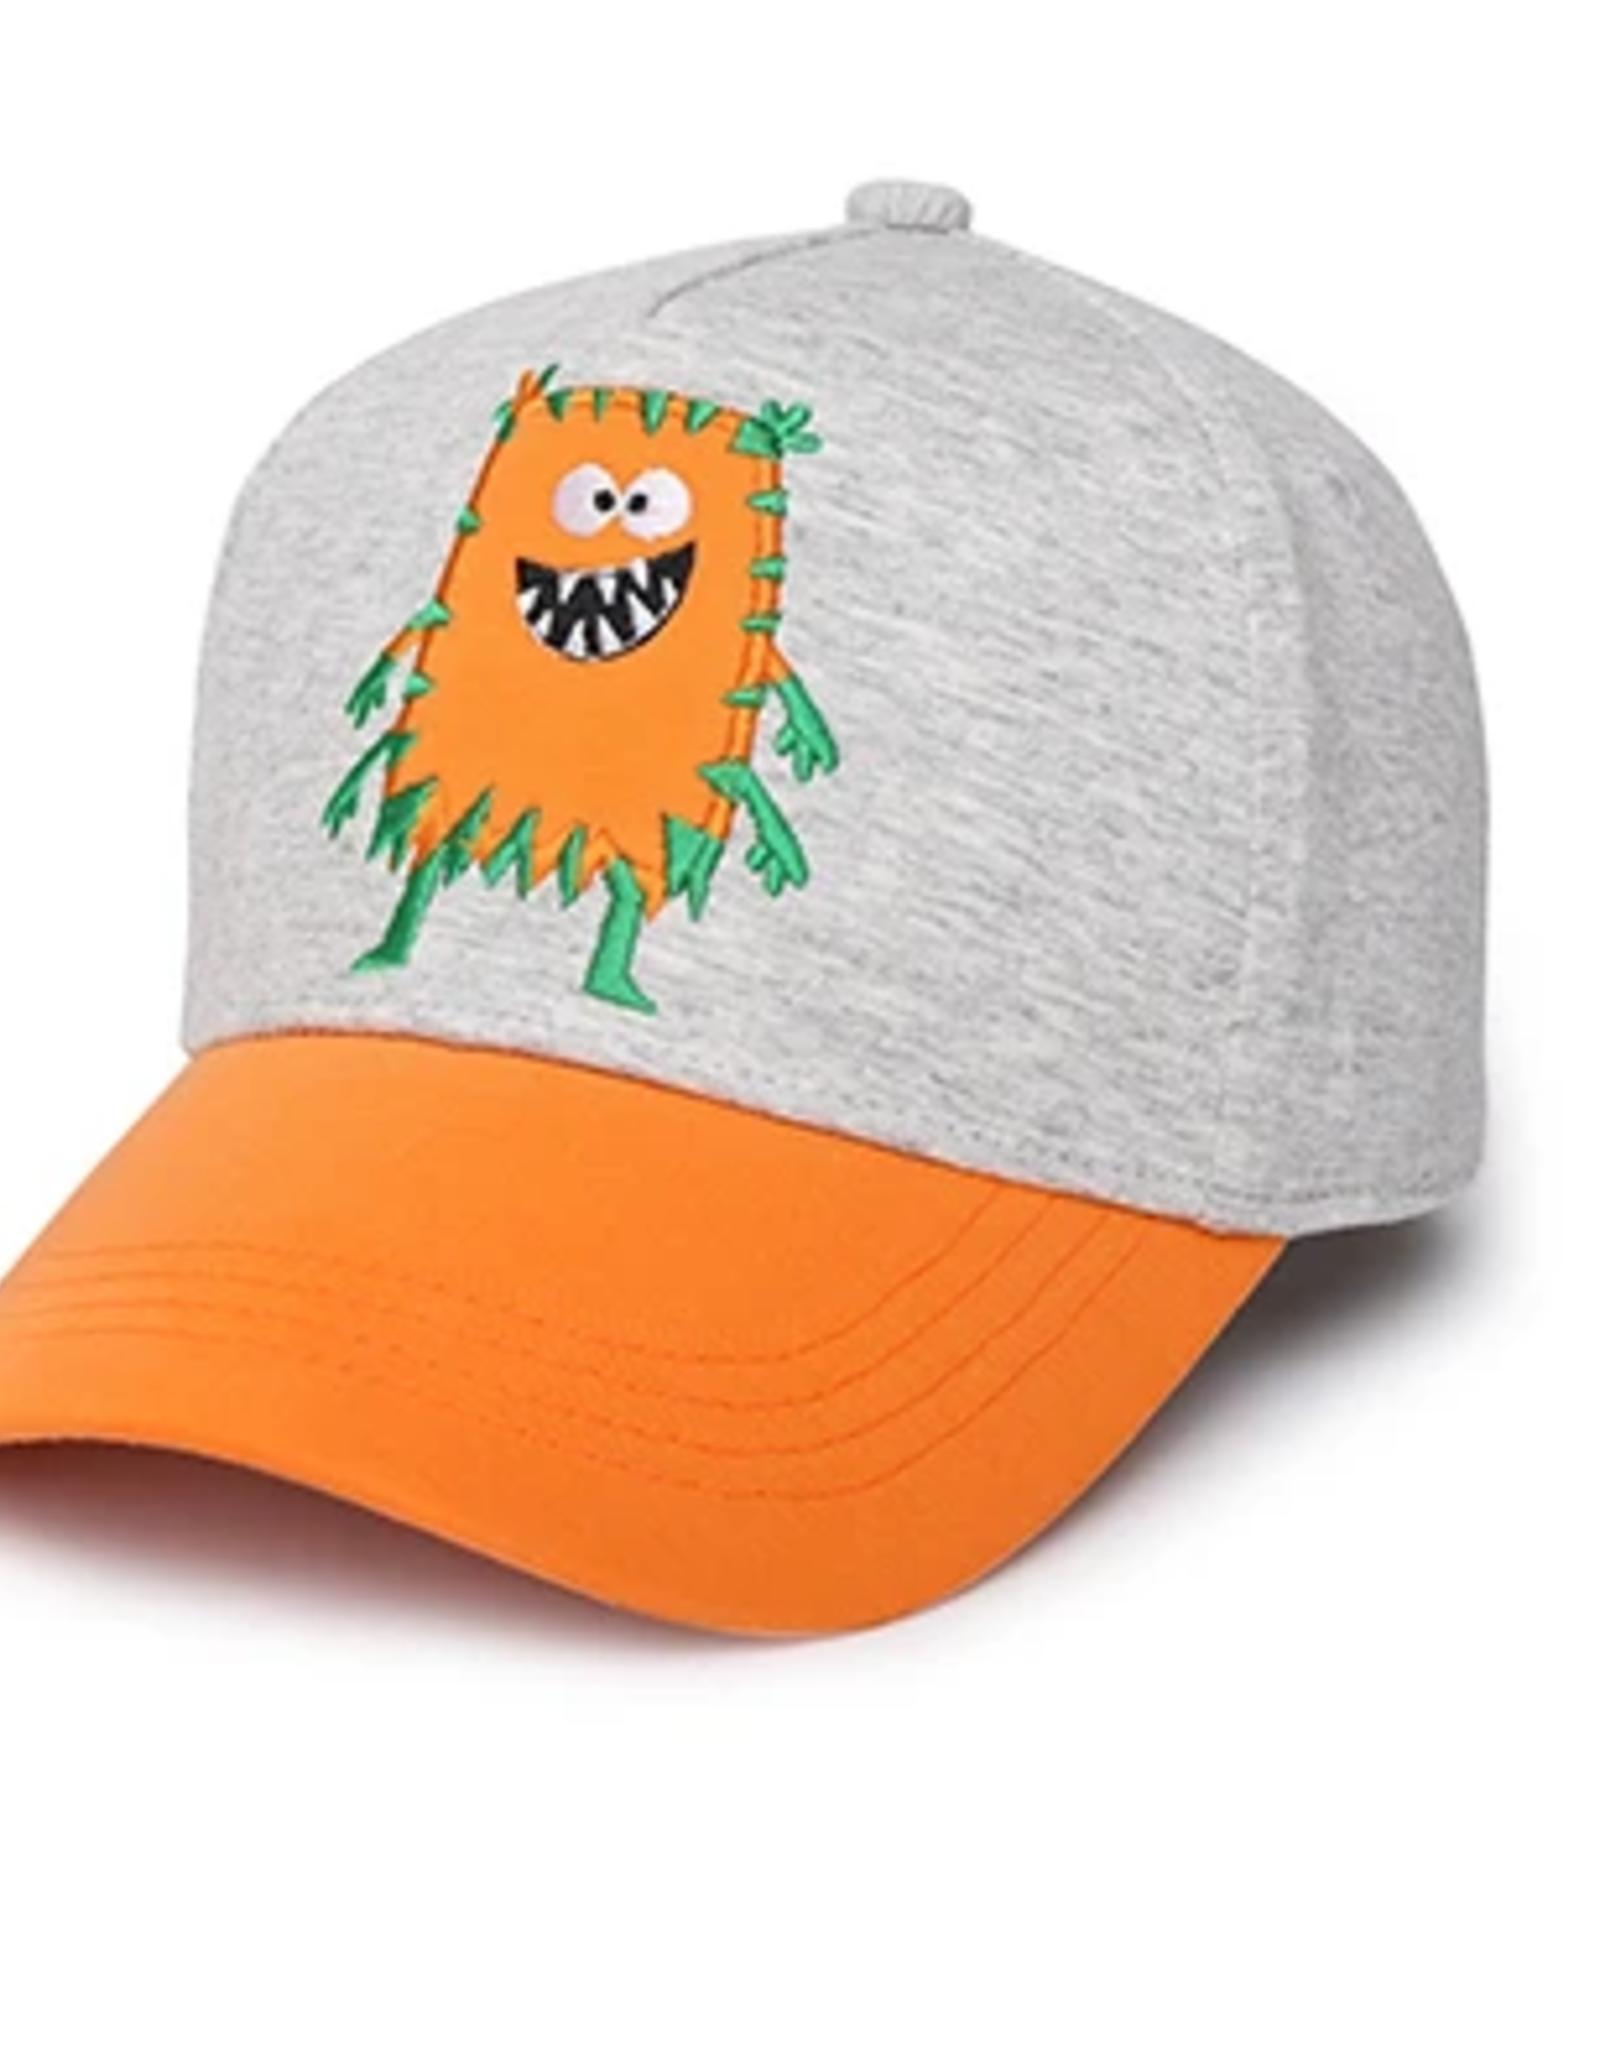 Flap Jacks Flap Jacks Kids Caps - Orange Monster